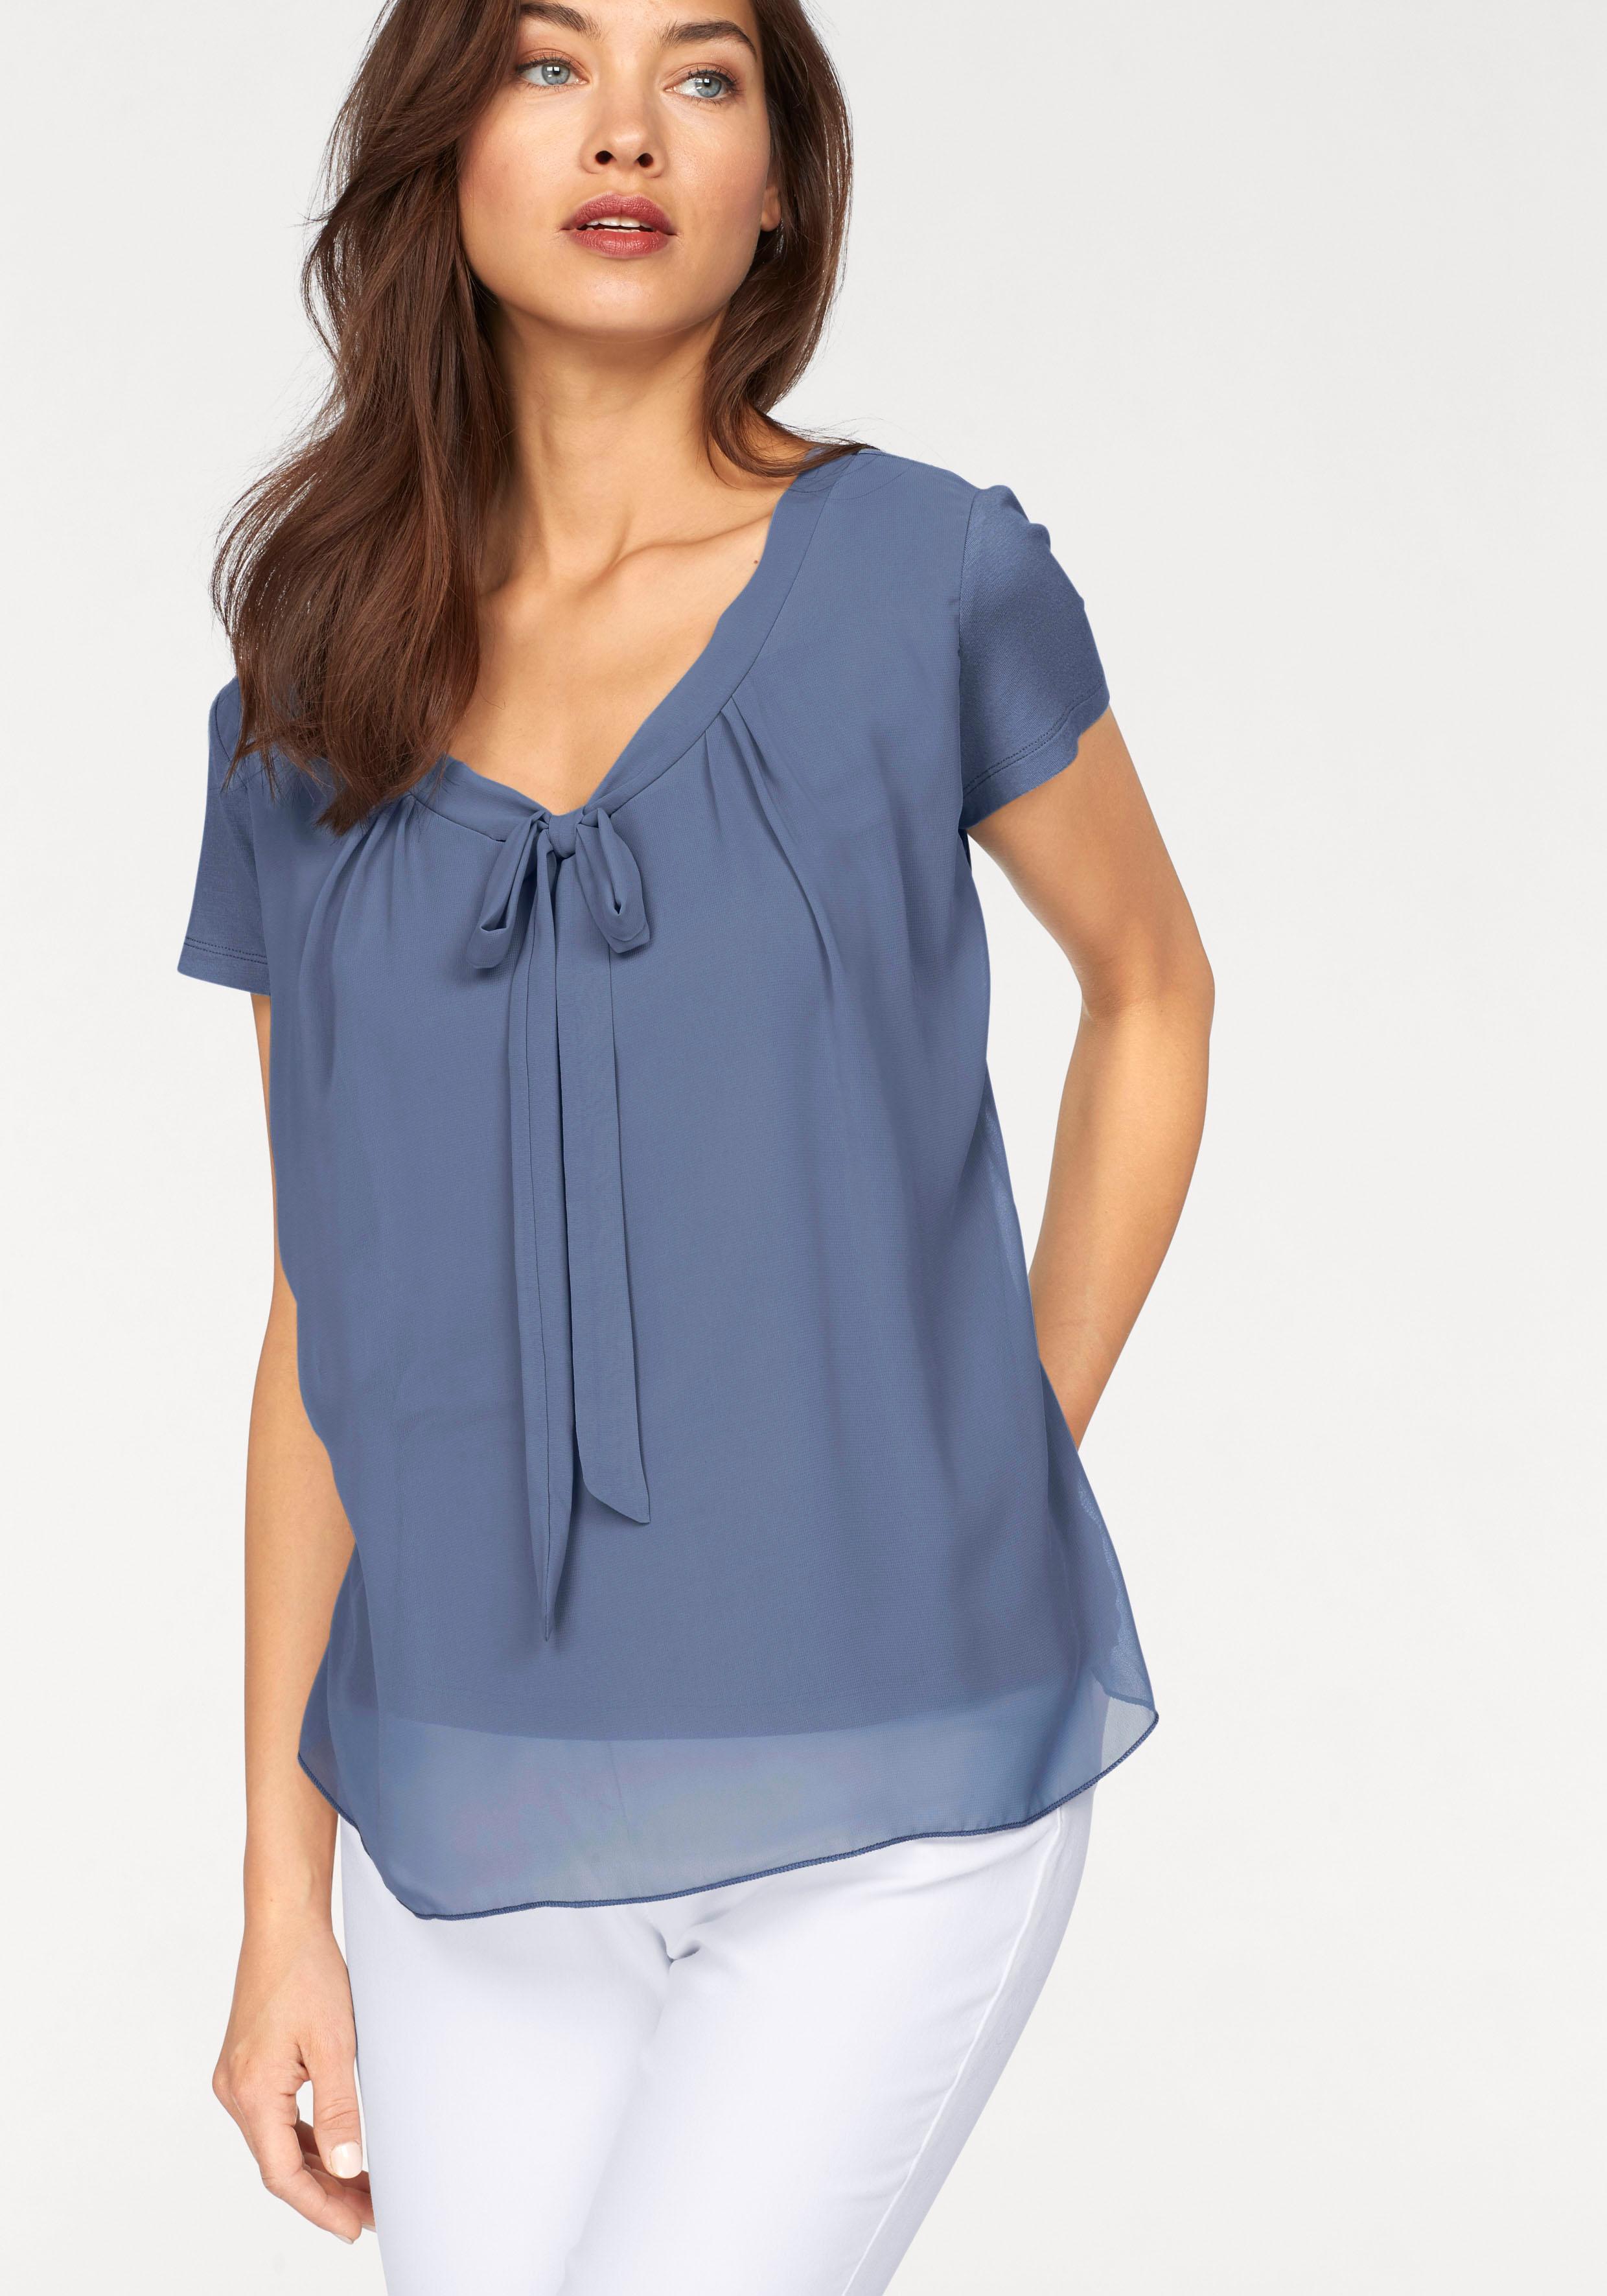 Image of Aniston SELECTED Shirtbluse